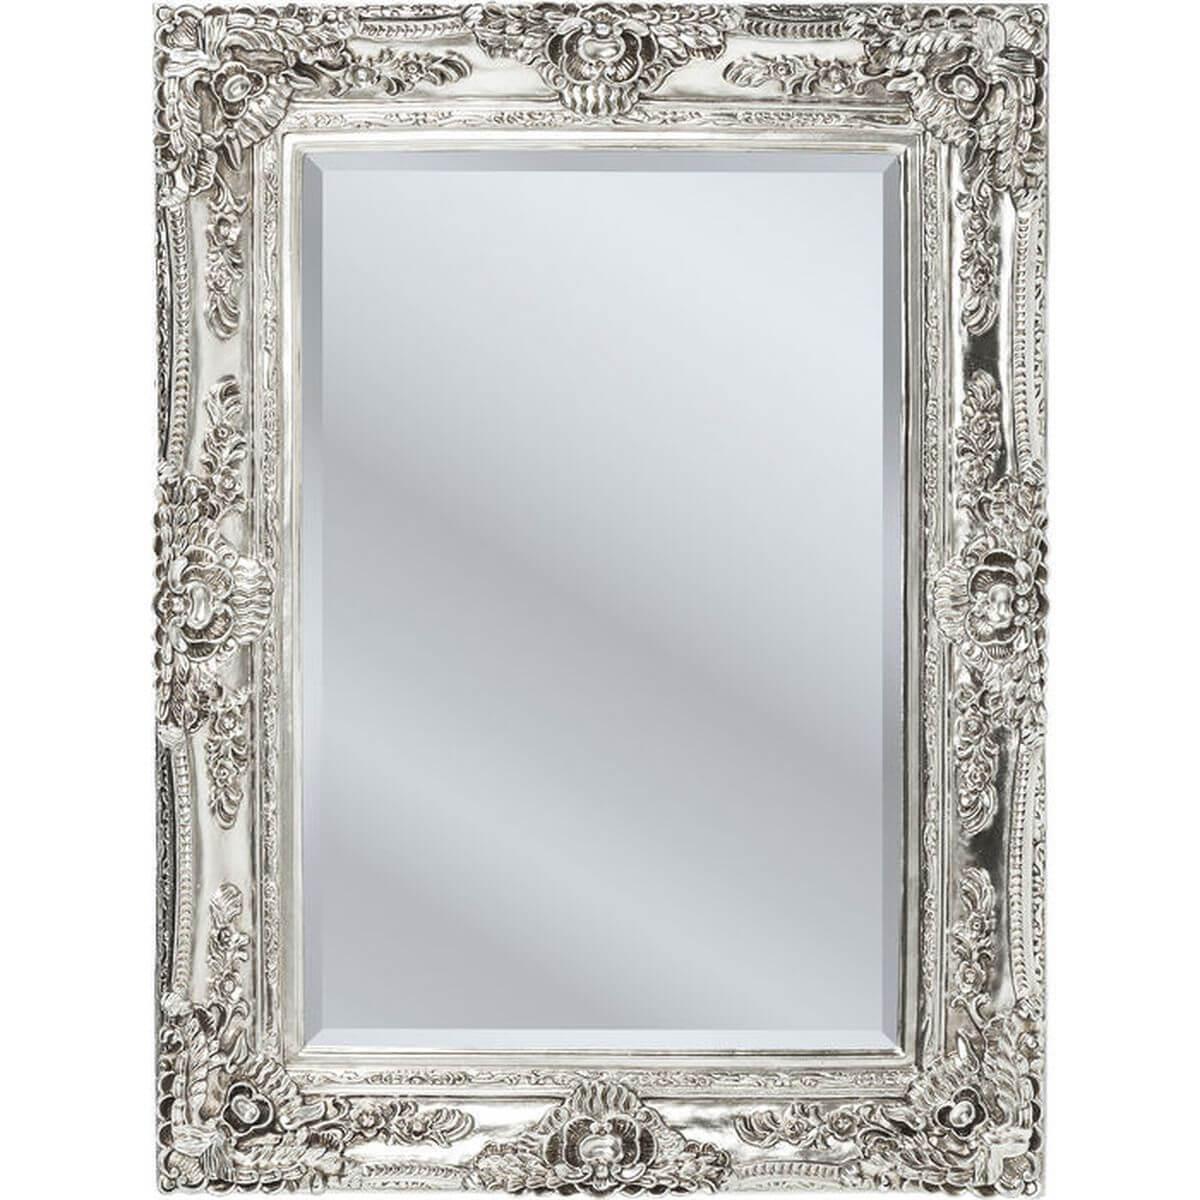 Mirror Royal Residence 118x88cm